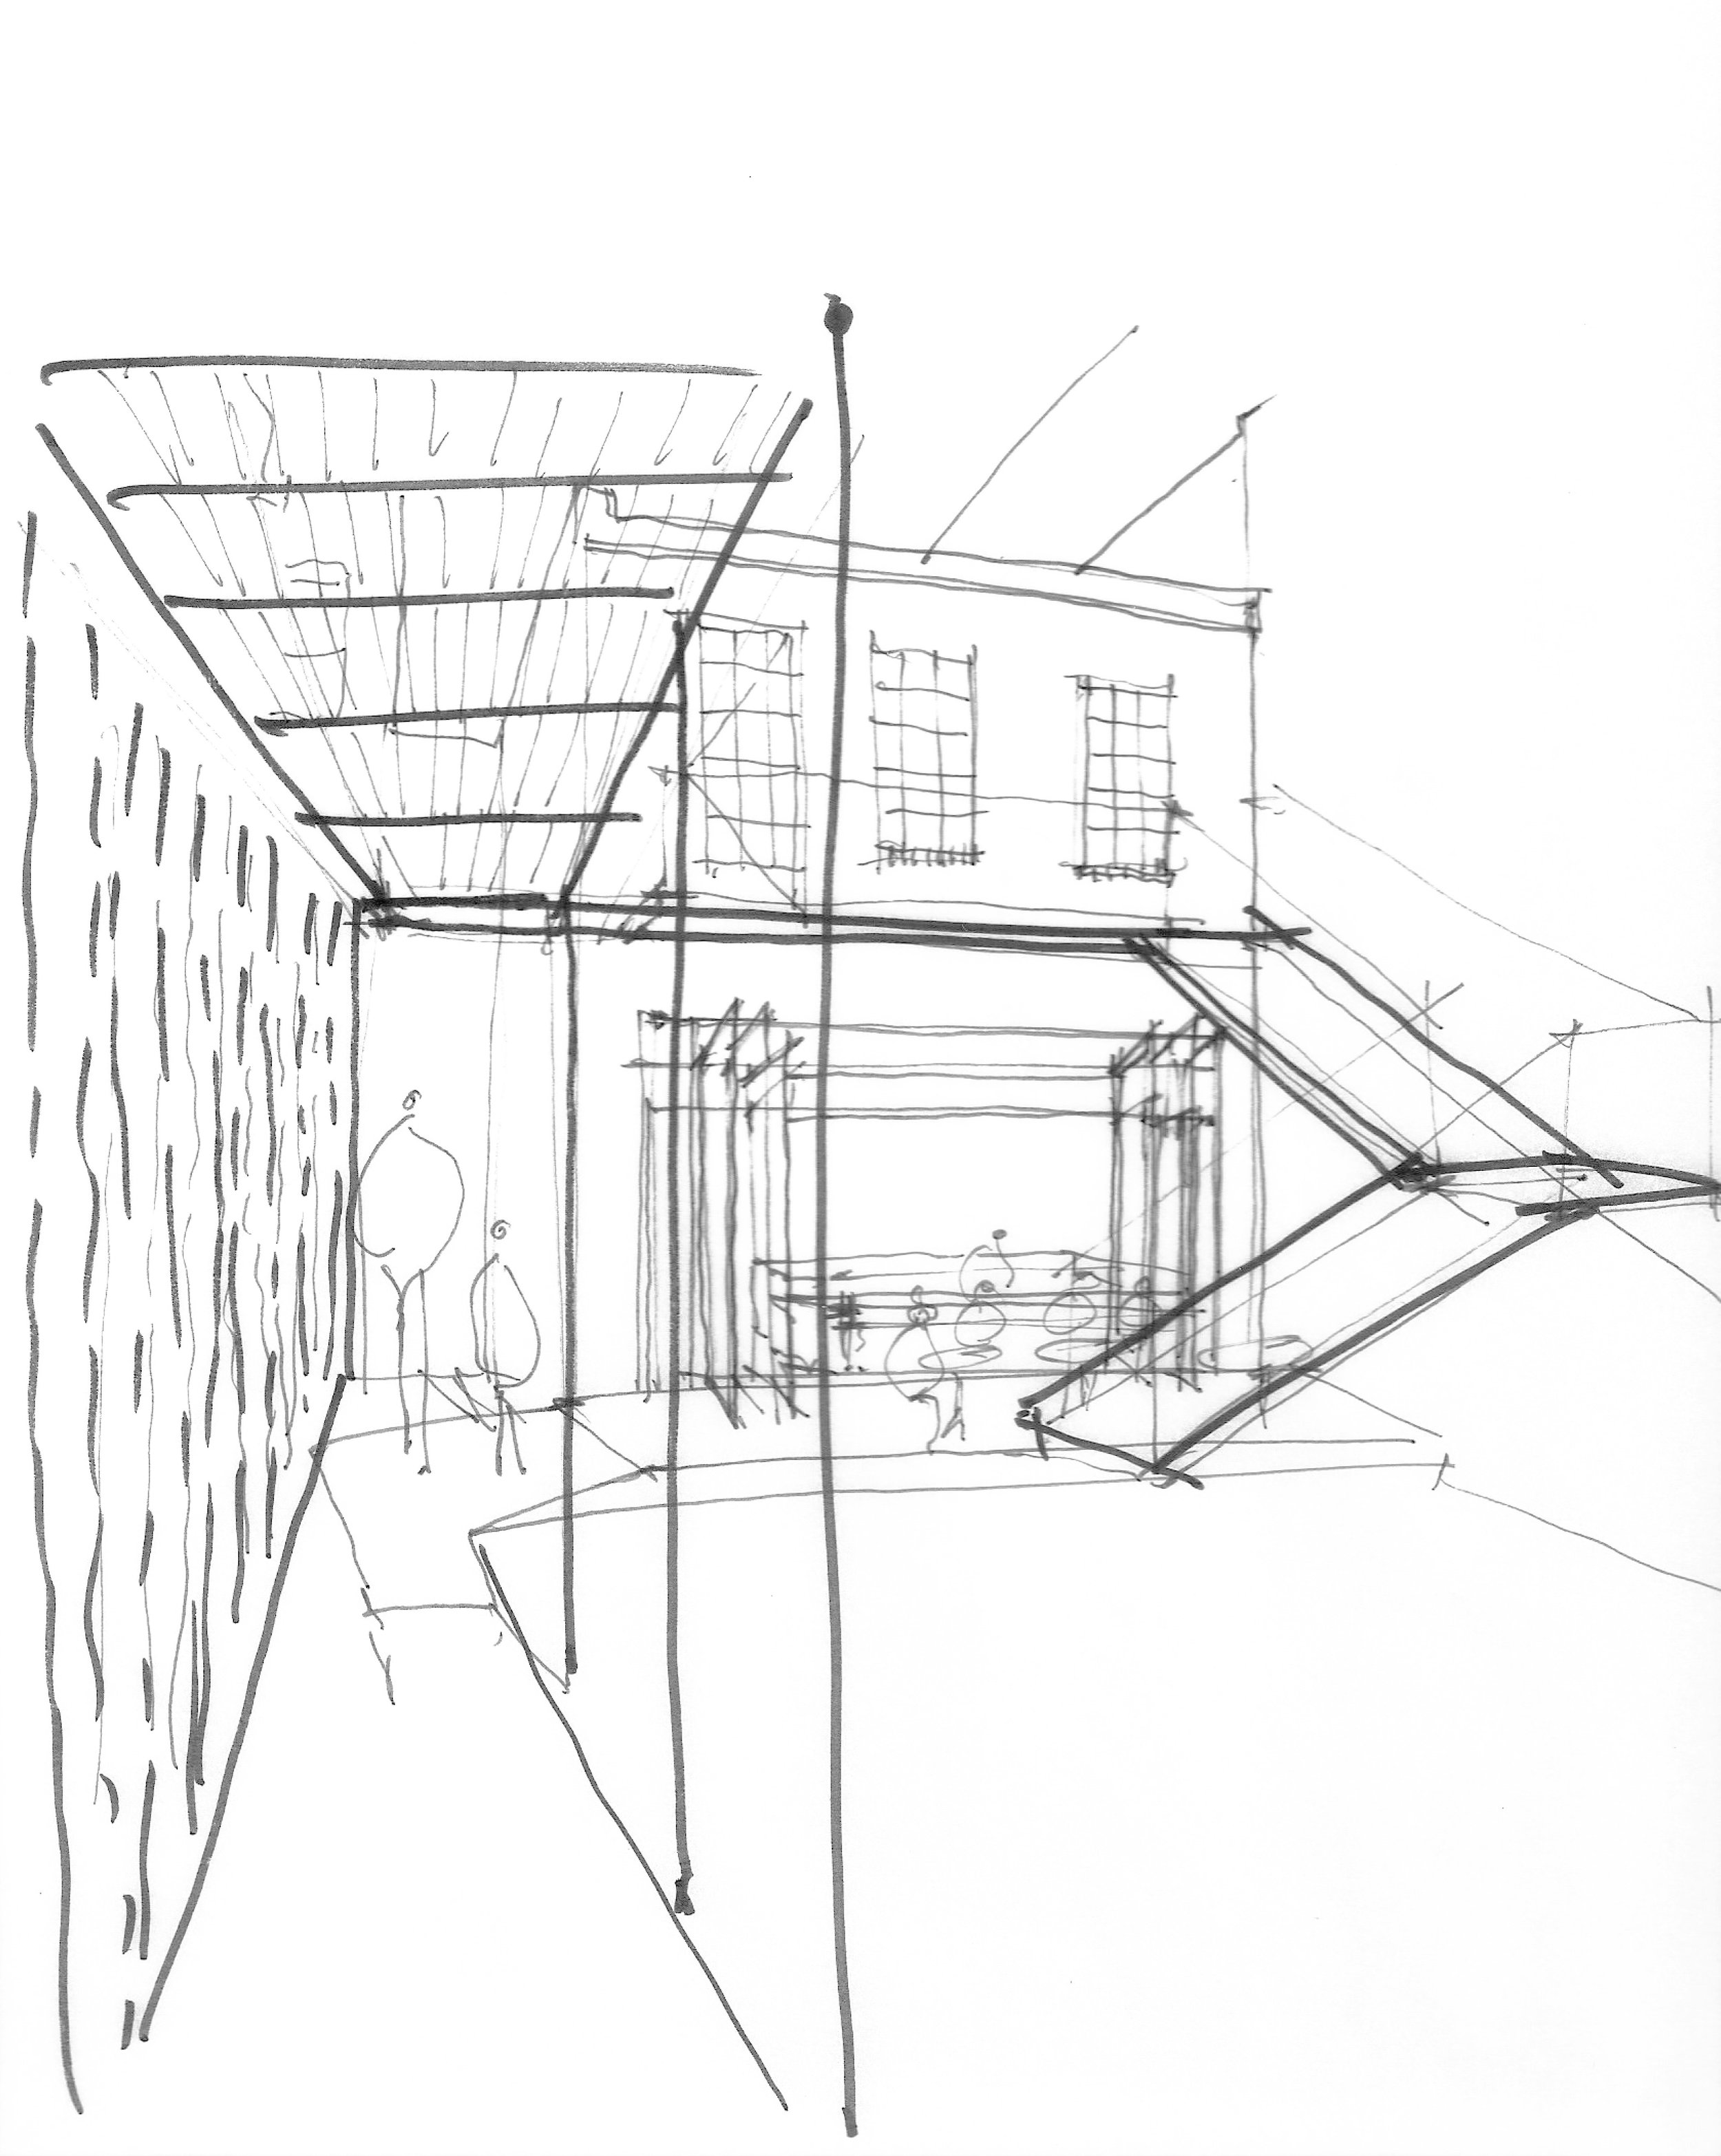 studio-saint-bars-and-restaurants-maketto-washington-dc-sketch-6